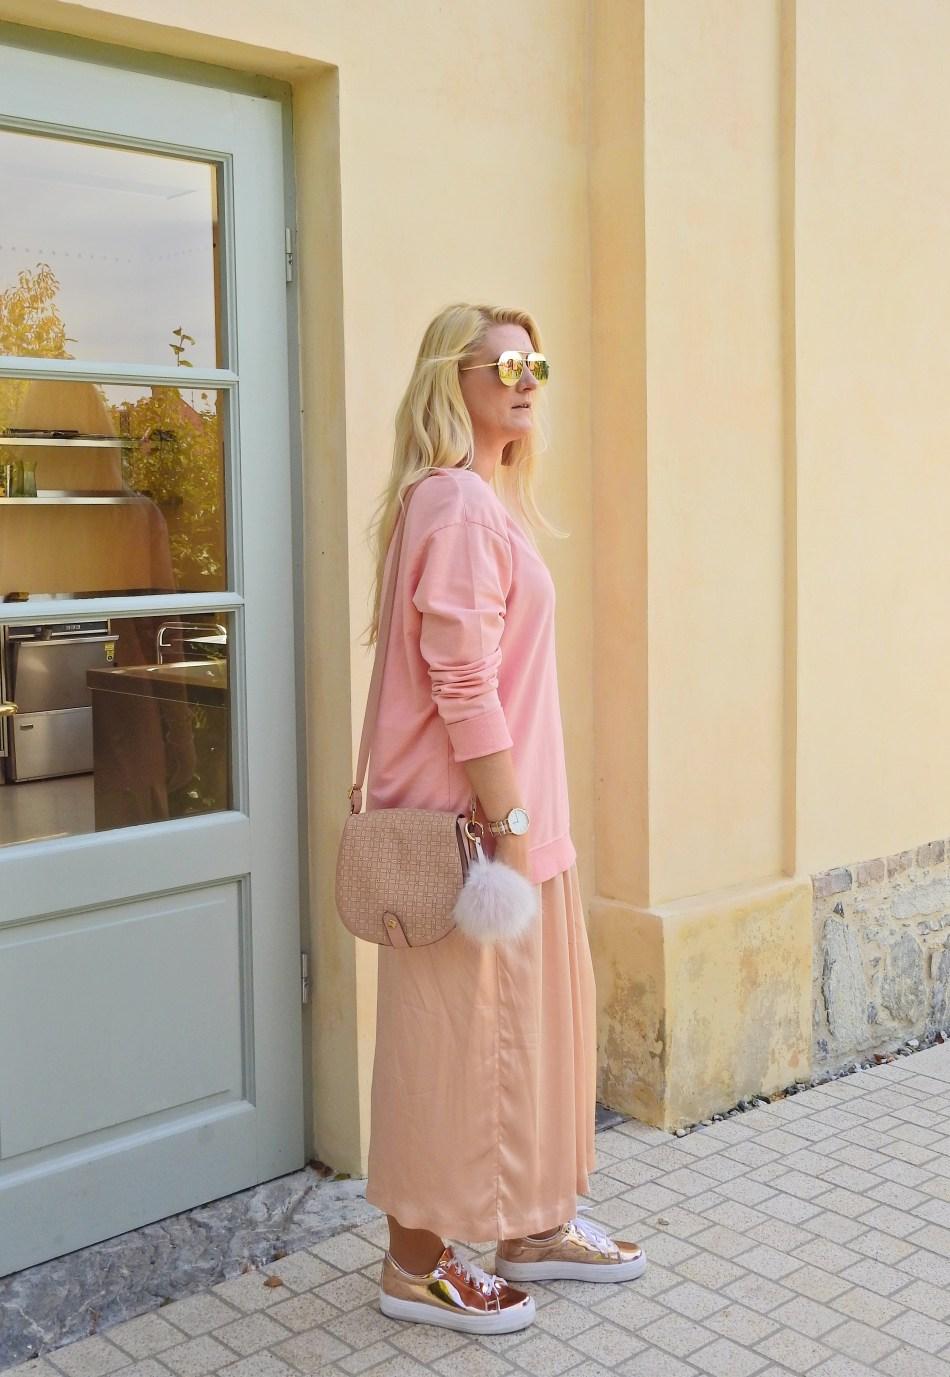 Rosegold-Allinpink-Culottes-Sweater-Daniel-Wellington-Watch-carrieslifestyle-Tamara-Prutsch